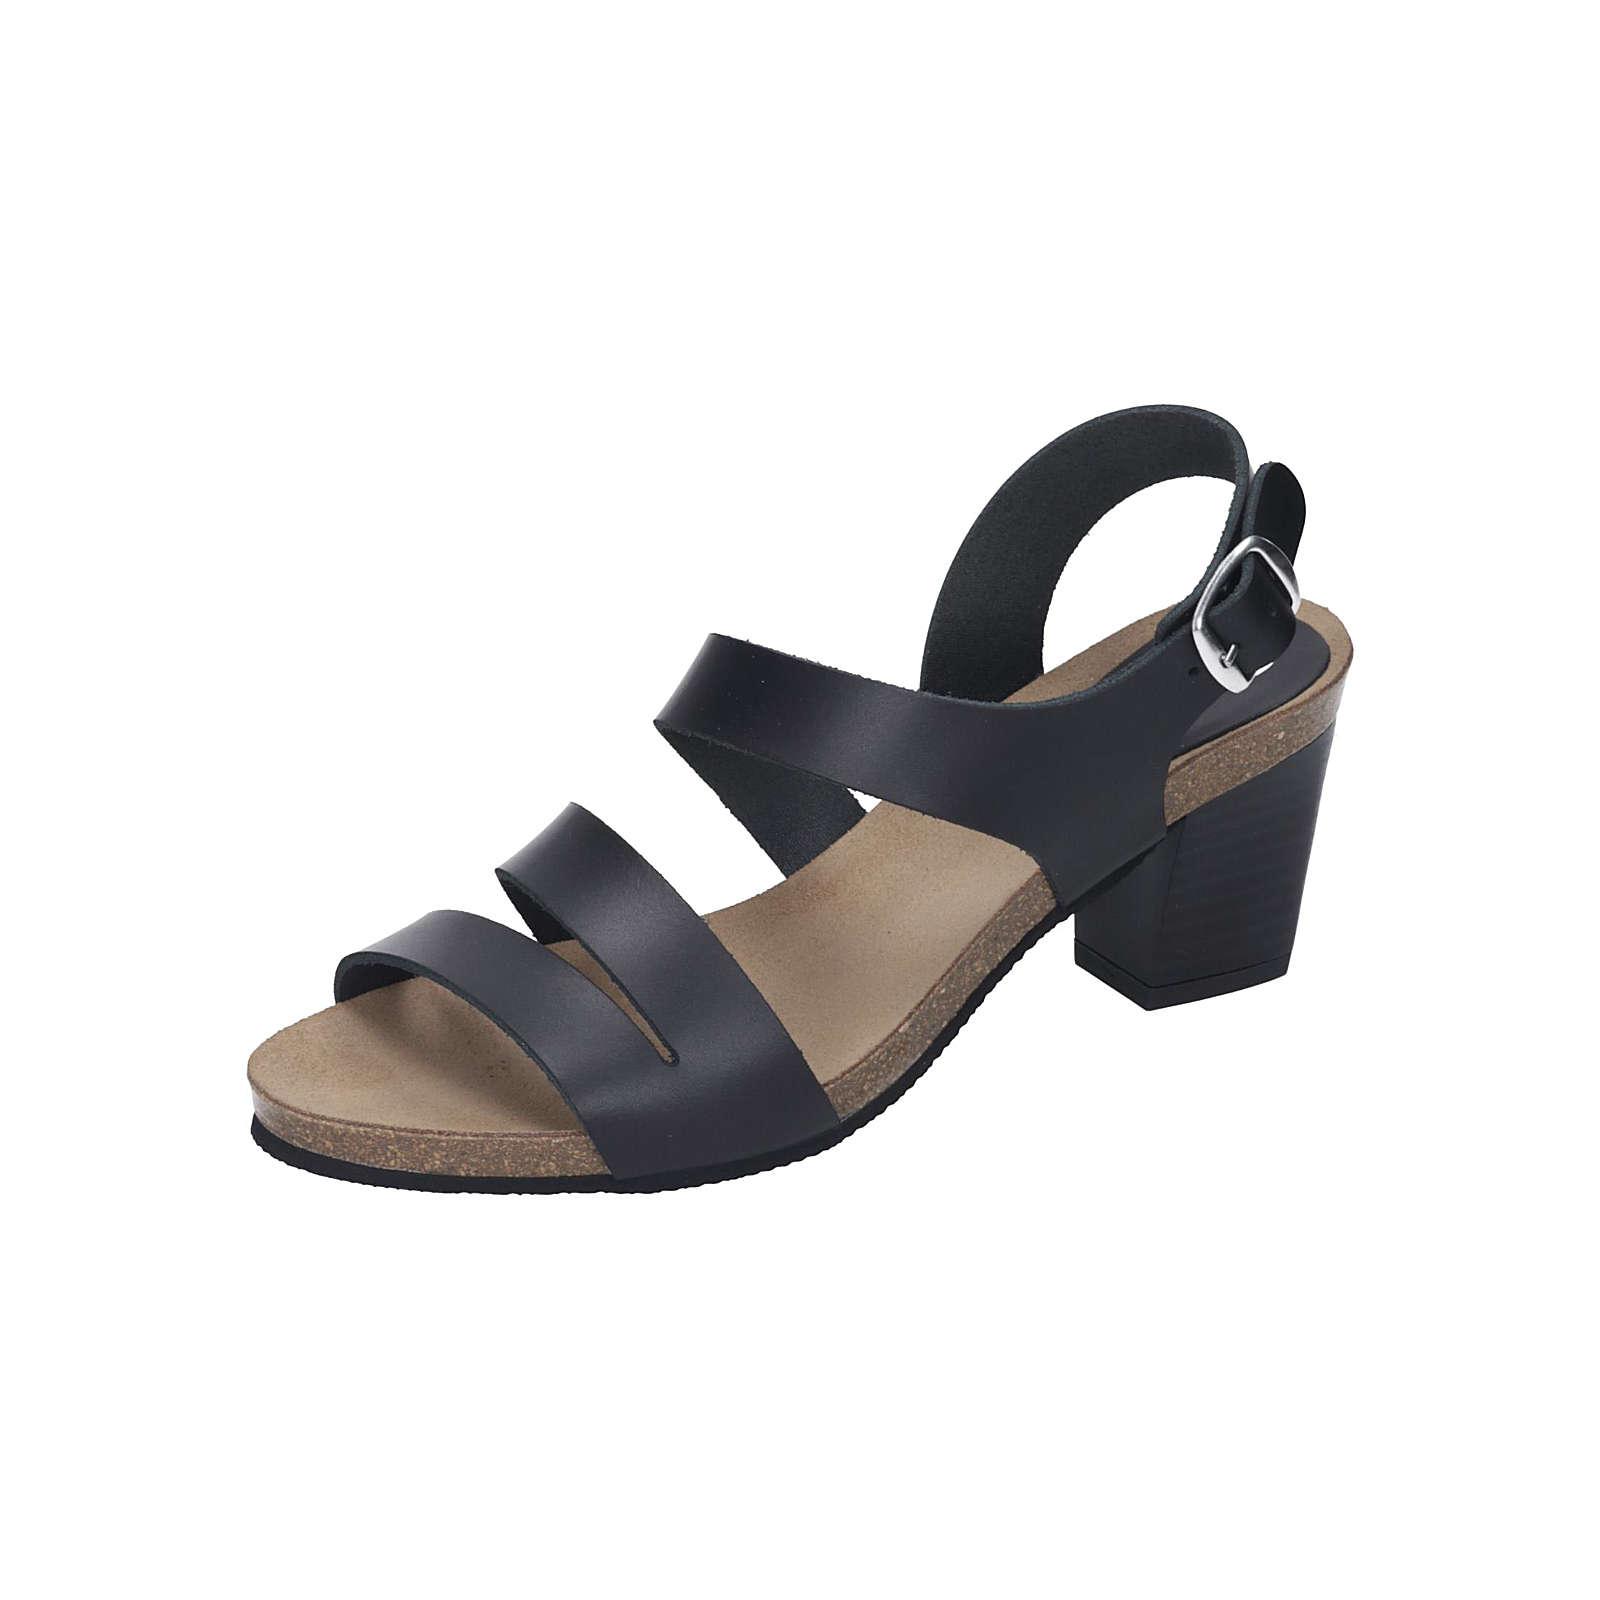 Dr. BRINKMANN Damen Sandale Komfort-Sandalen schwarz Damen Gr. 36